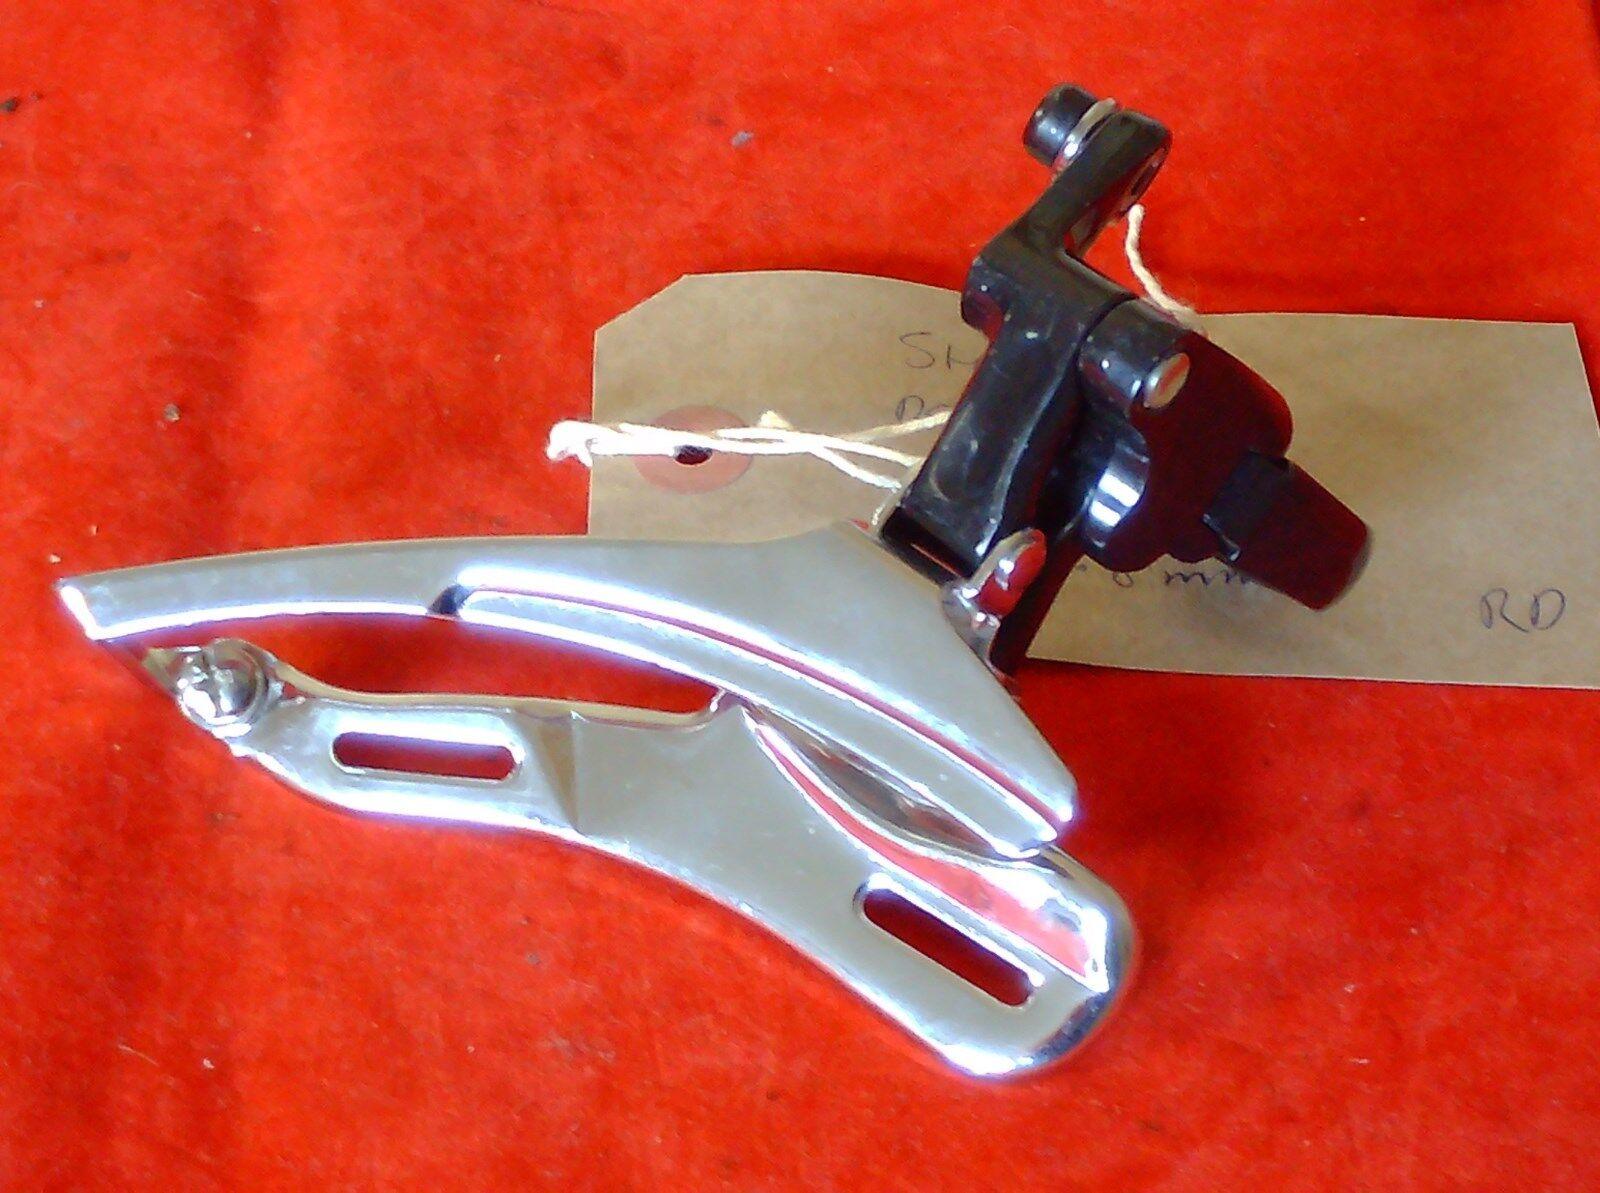 NOS SHIMANO DEORE LX 31.8mm    FRONT DERAILLEUR FD-M560, 1993  comfortably